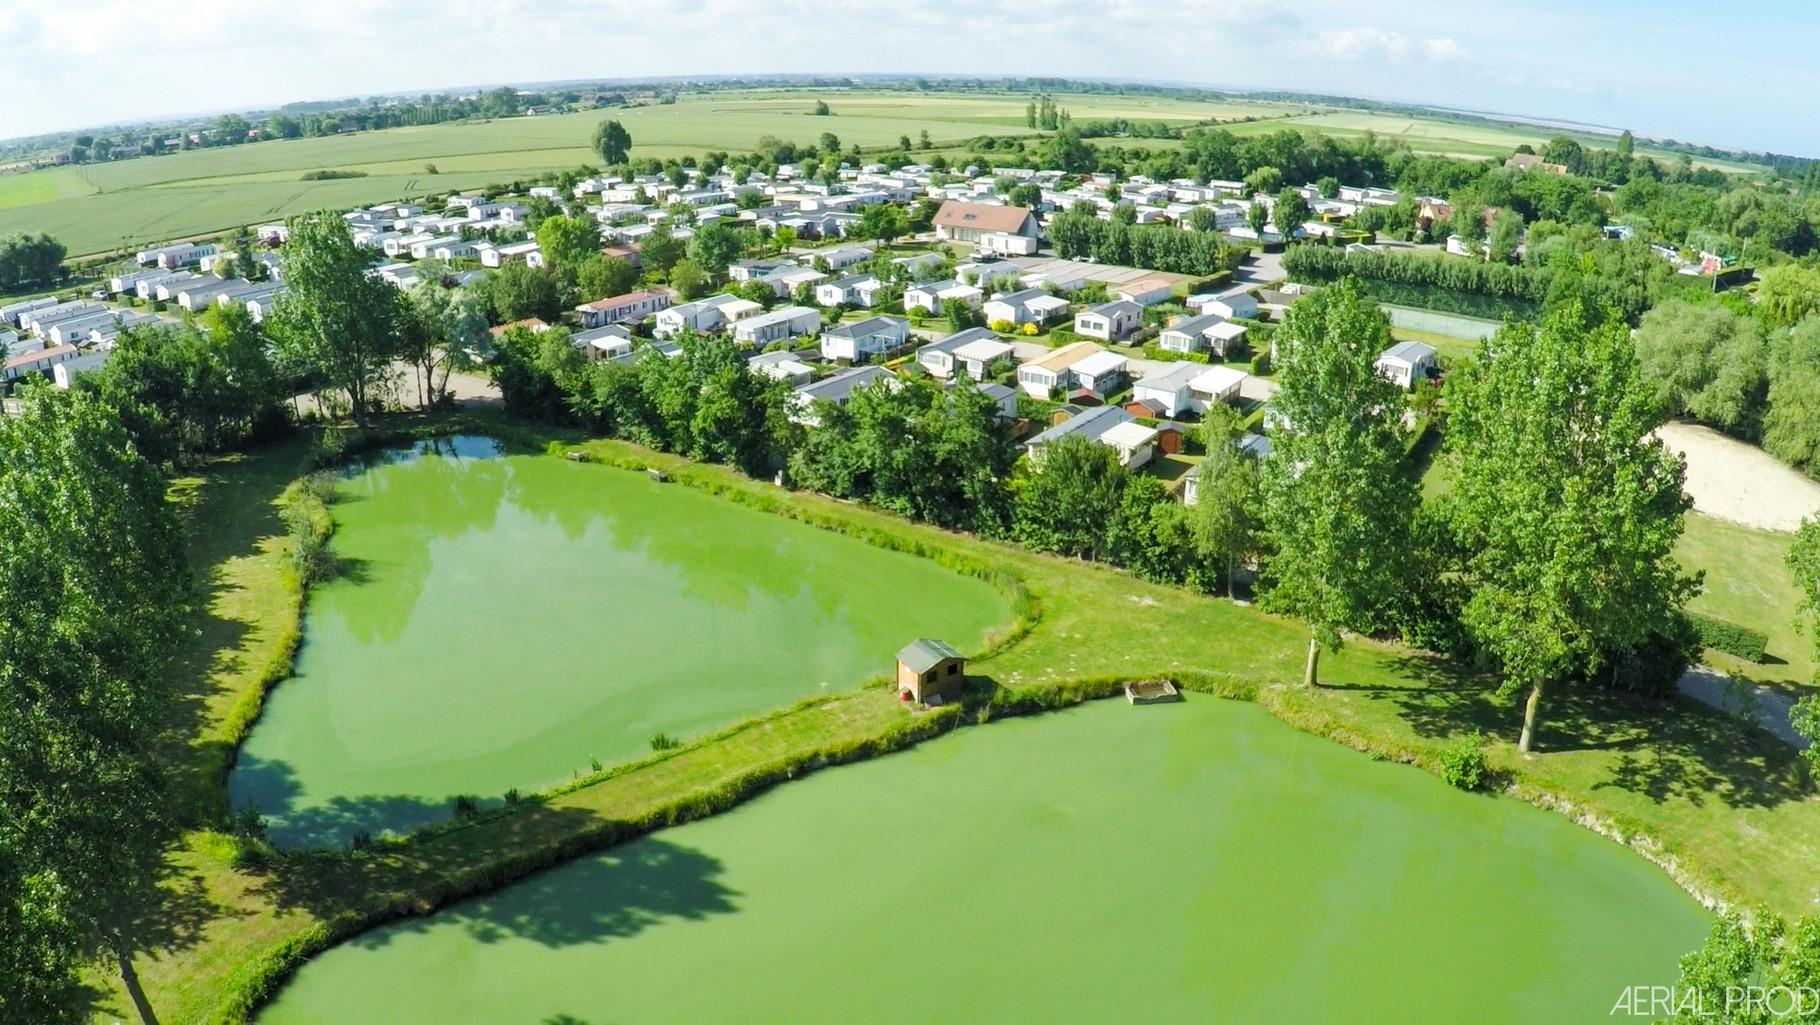 campings avec étangs de pêche en Picardie